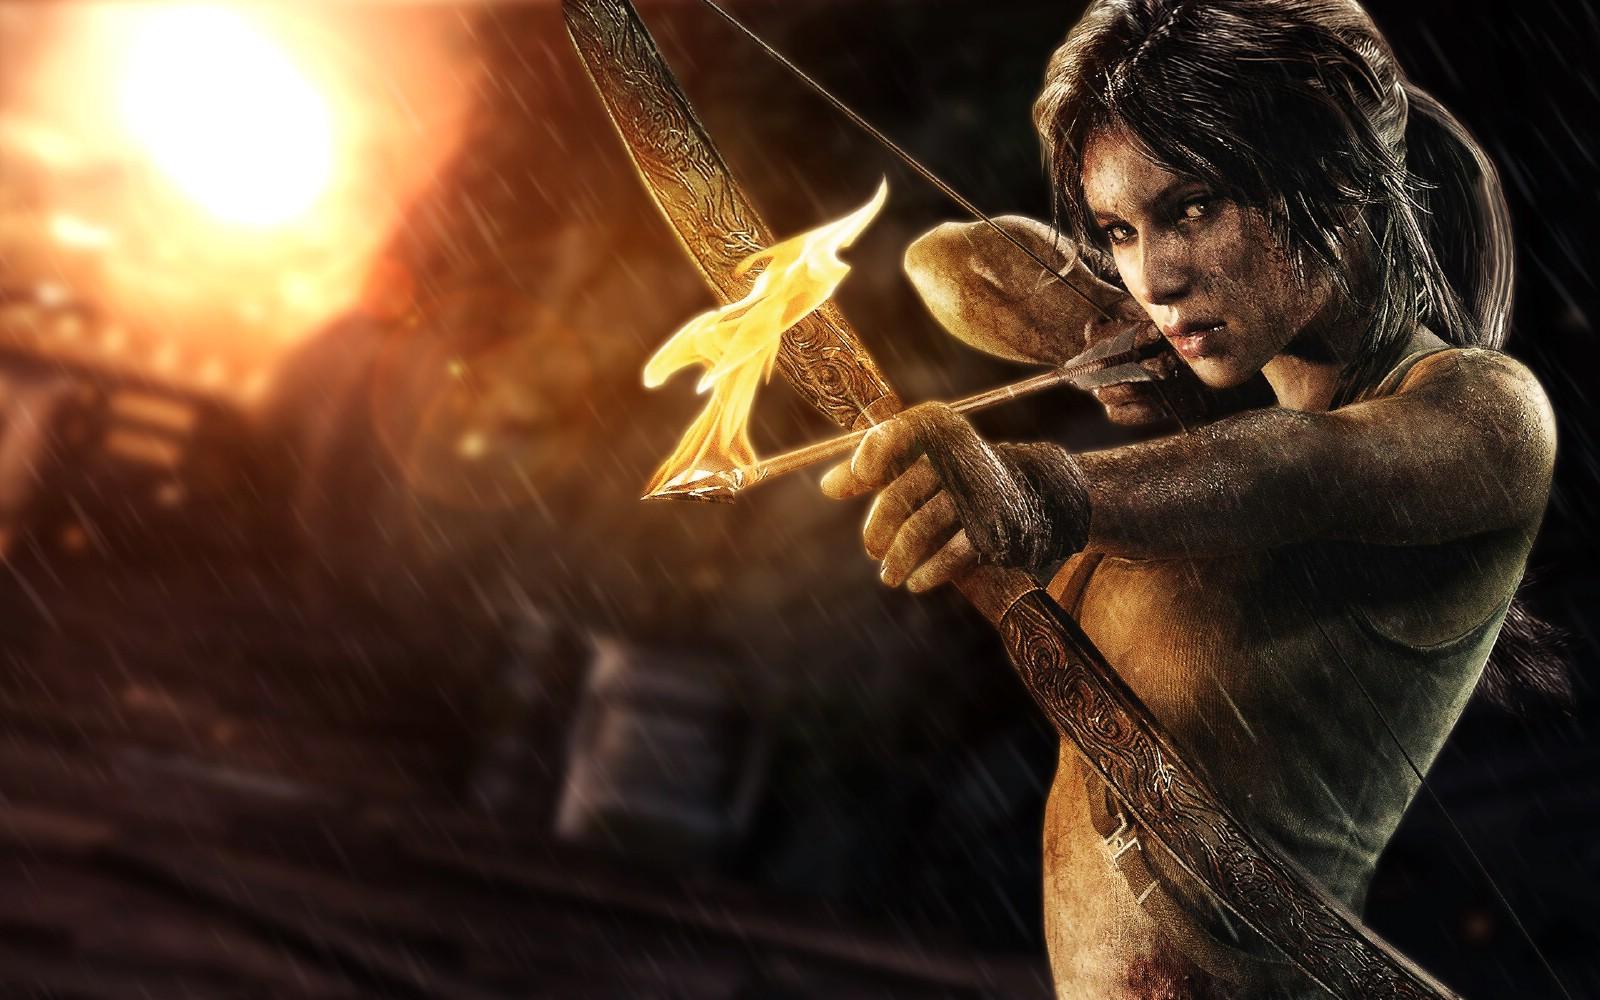 http://2.bp.blogspot.com/-yczxjHjplZg/UZBzhQxLSwI/AAAAAAAAAkE/eAvzHuoepT8/s1600/Tomb+Raider+2013+Game+Wallpaper.jpg